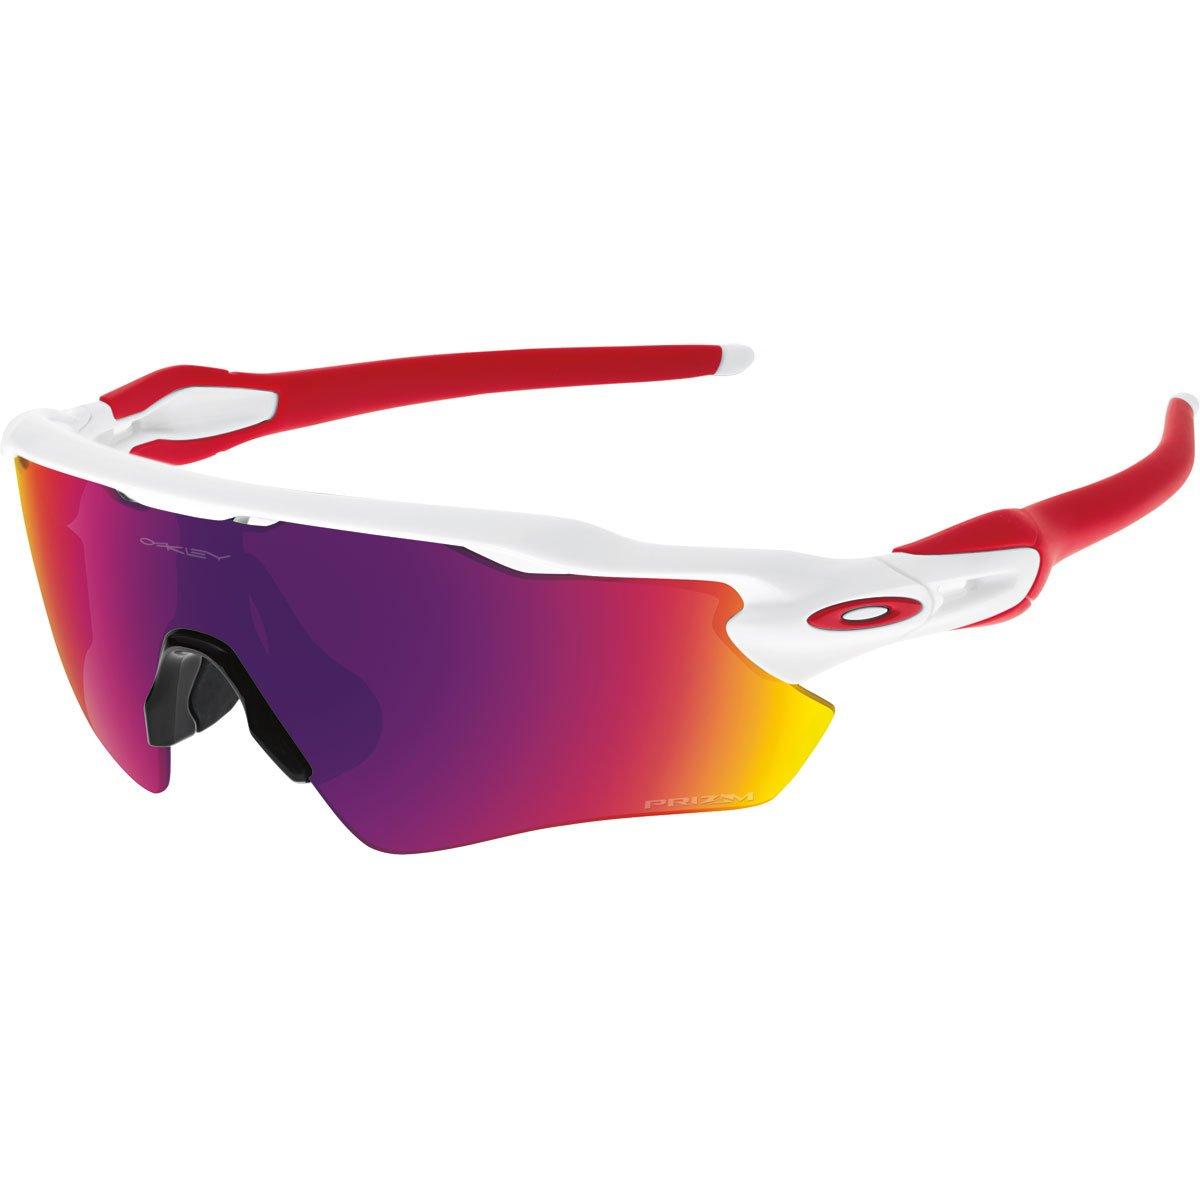 Oakley Men s Radar Shield Sunglasses